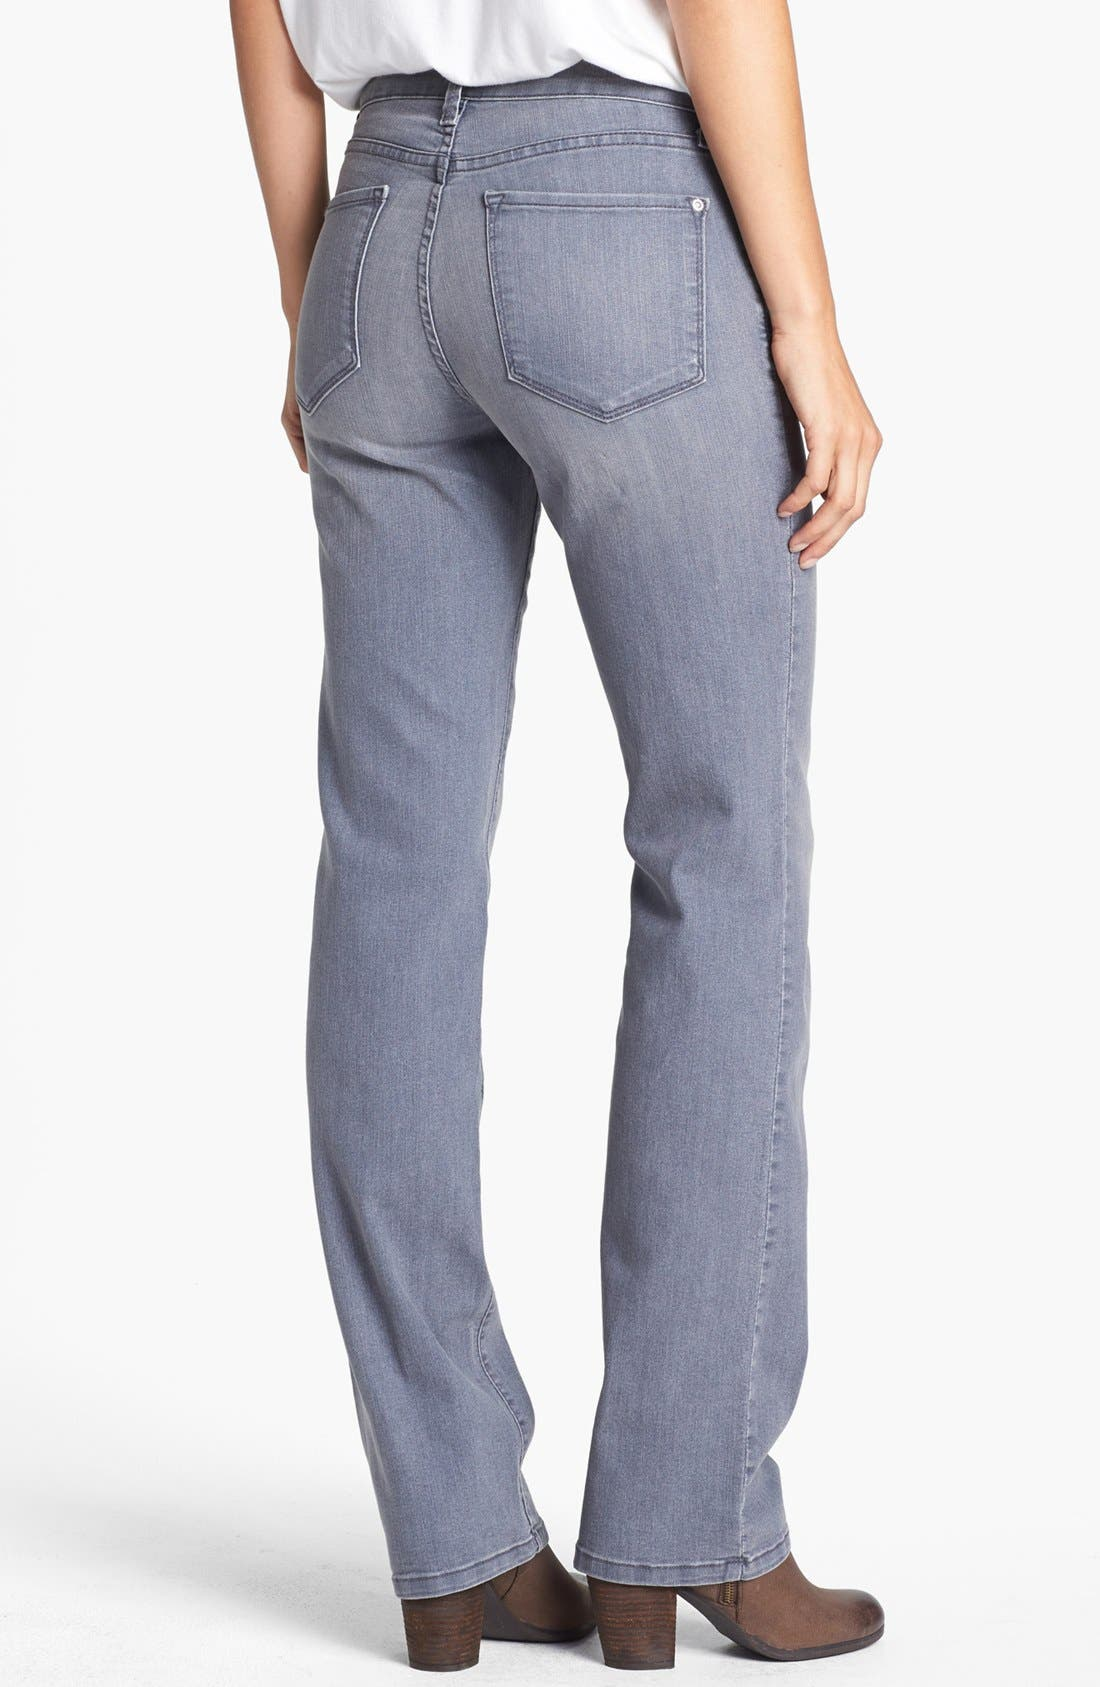 Alternate Image 2  - NYDJ 'Marilyn' Straight Leg Jeans (Grey) (Petite)